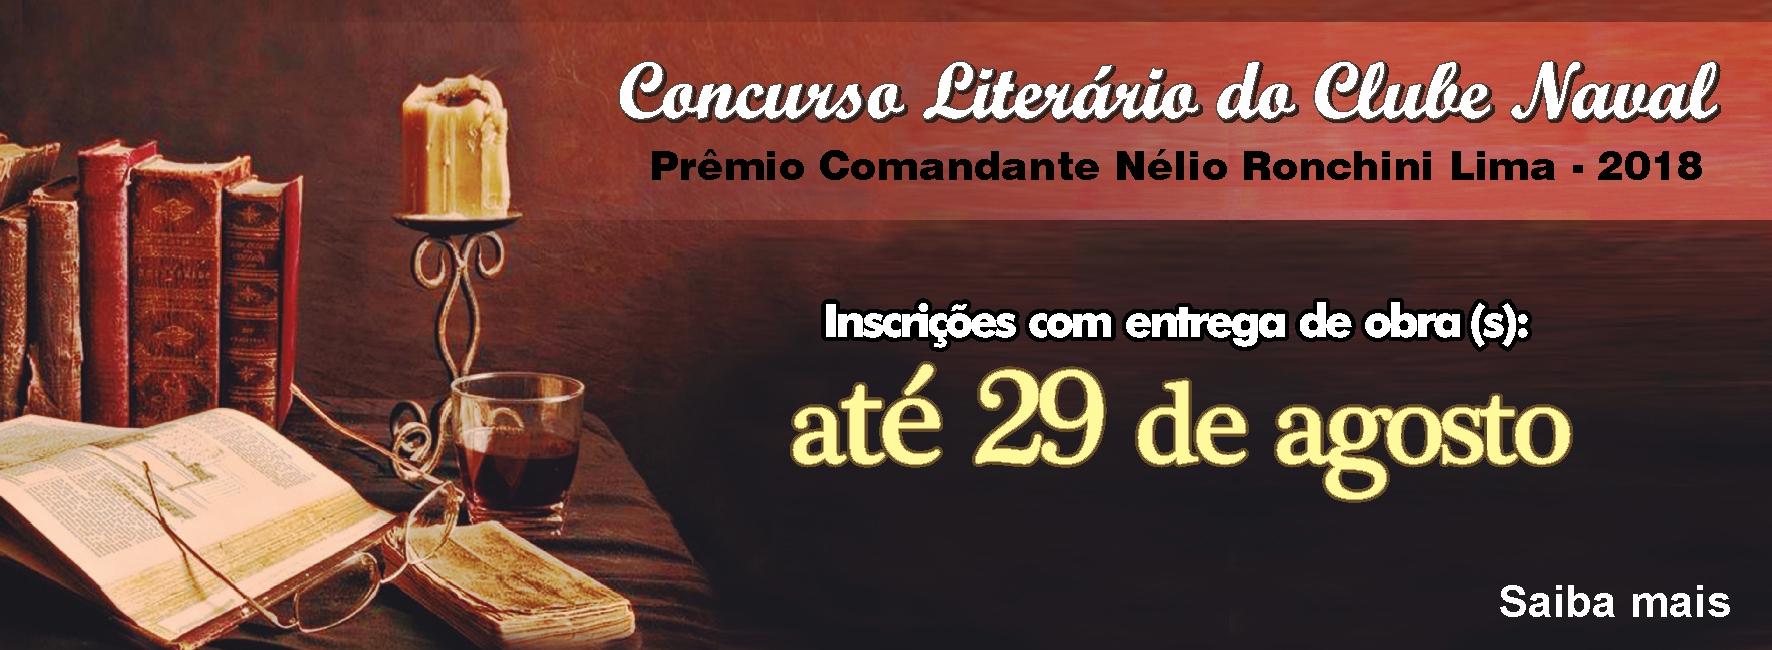 https://www.clubenaval.org.br/novo/concurso-liter%C3%A1rio-pr%C3%AAmio-cmg-nelio-ronchini-lima-2018-0